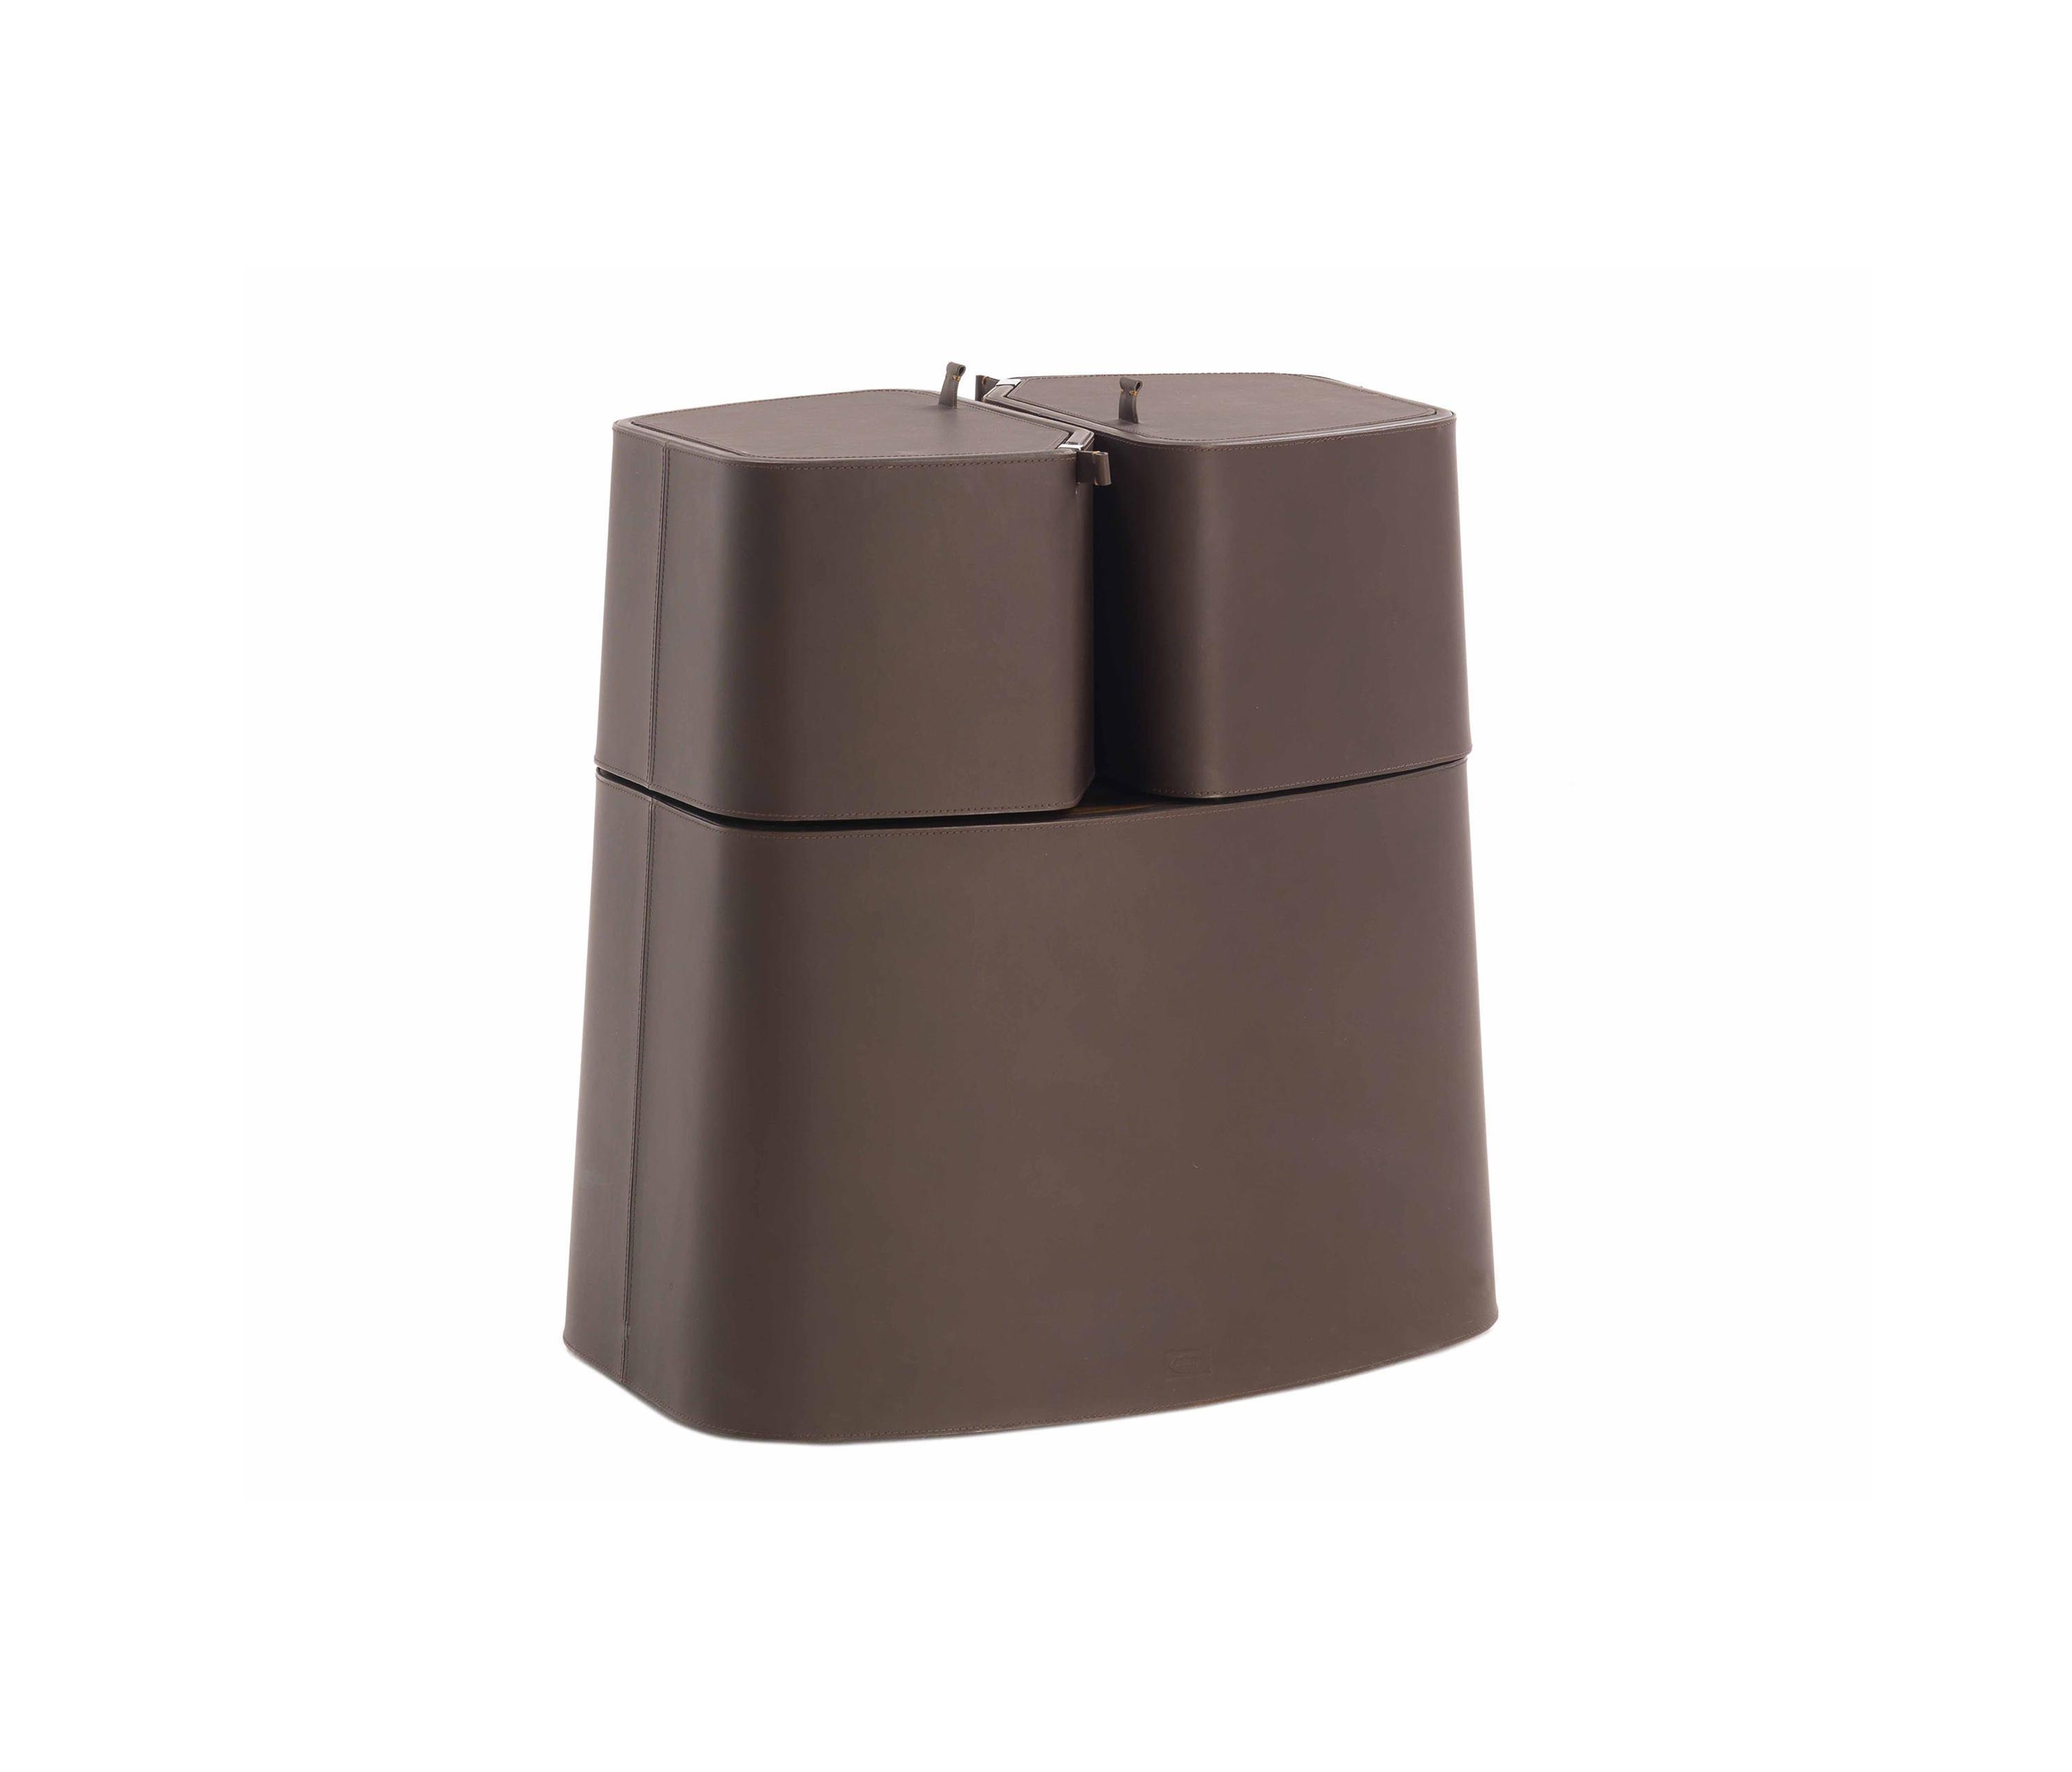 babel barschr nke hausbars von poltrona frau architonic. Black Bedroom Furniture Sets. Home Design Ideas